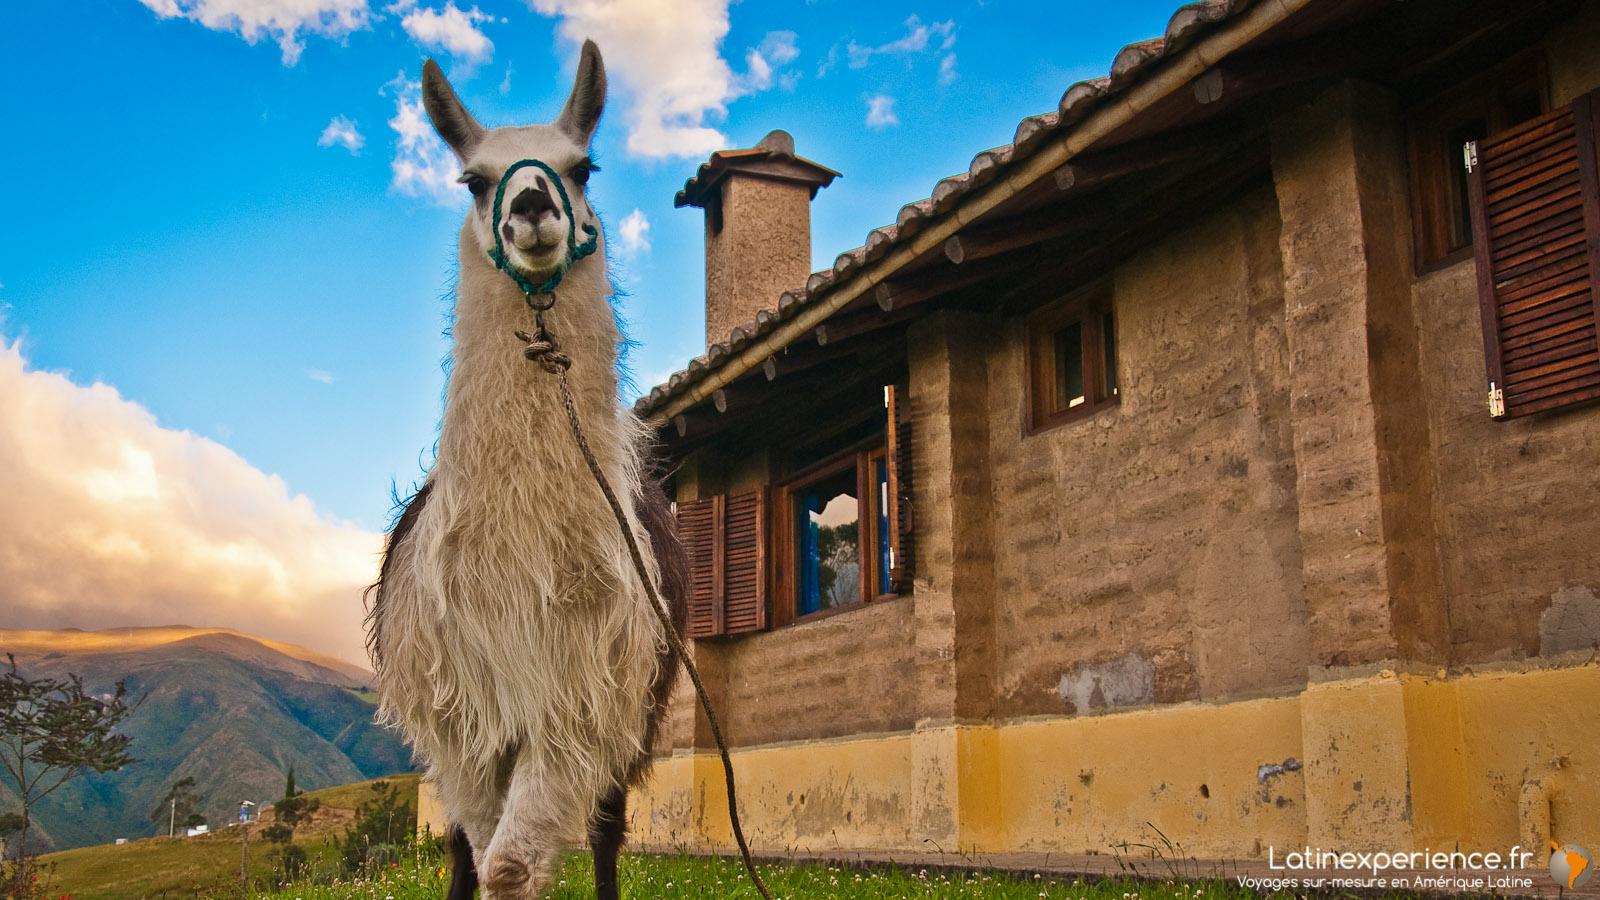 Equateur - Lama  -  Communautaire - Latinexperience voyages